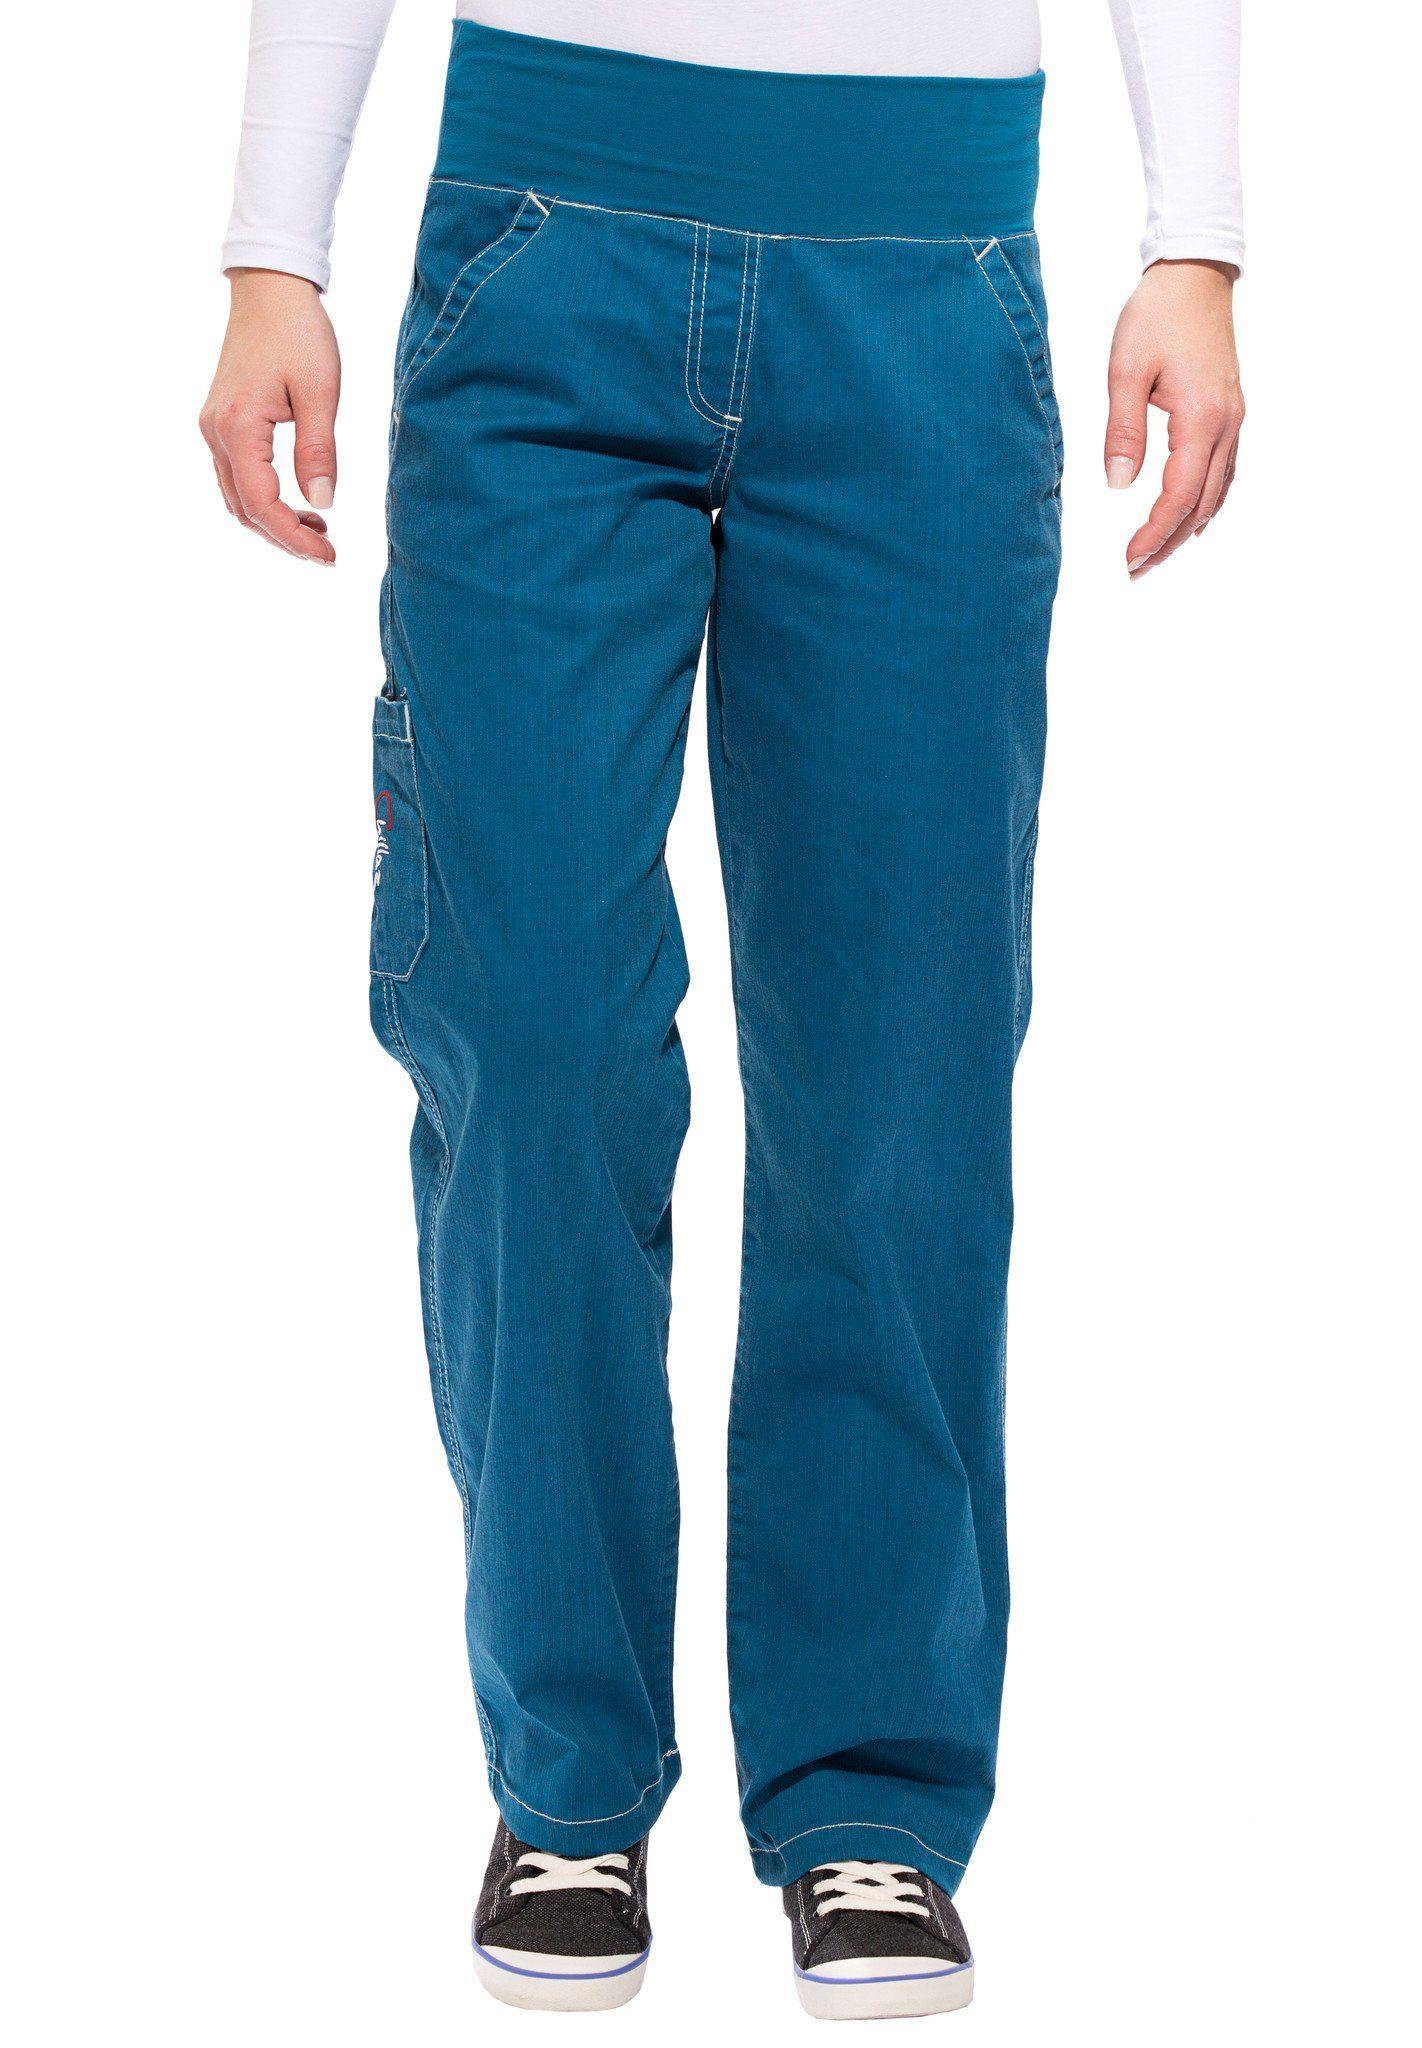 Chillaz Hose »Sandra's Pant Women blue«